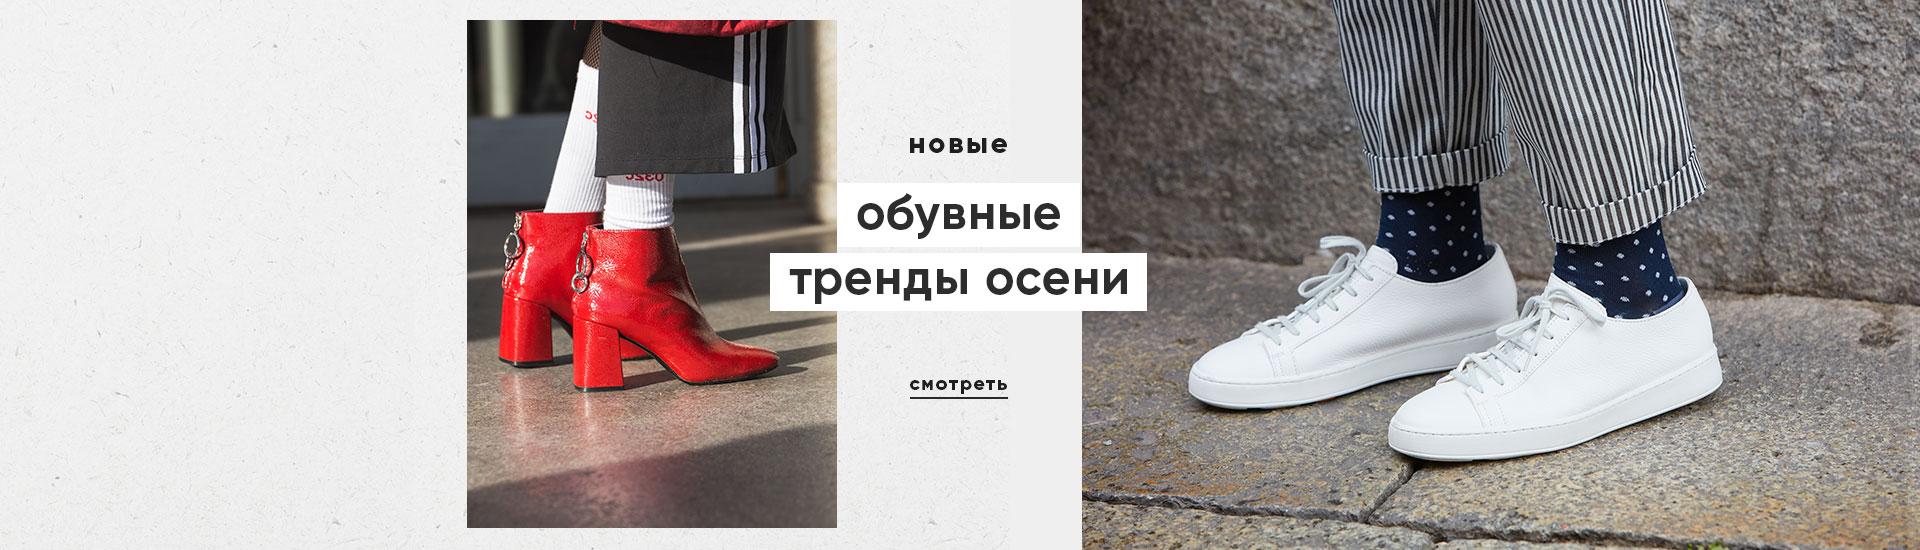 Обувные тренды Осень